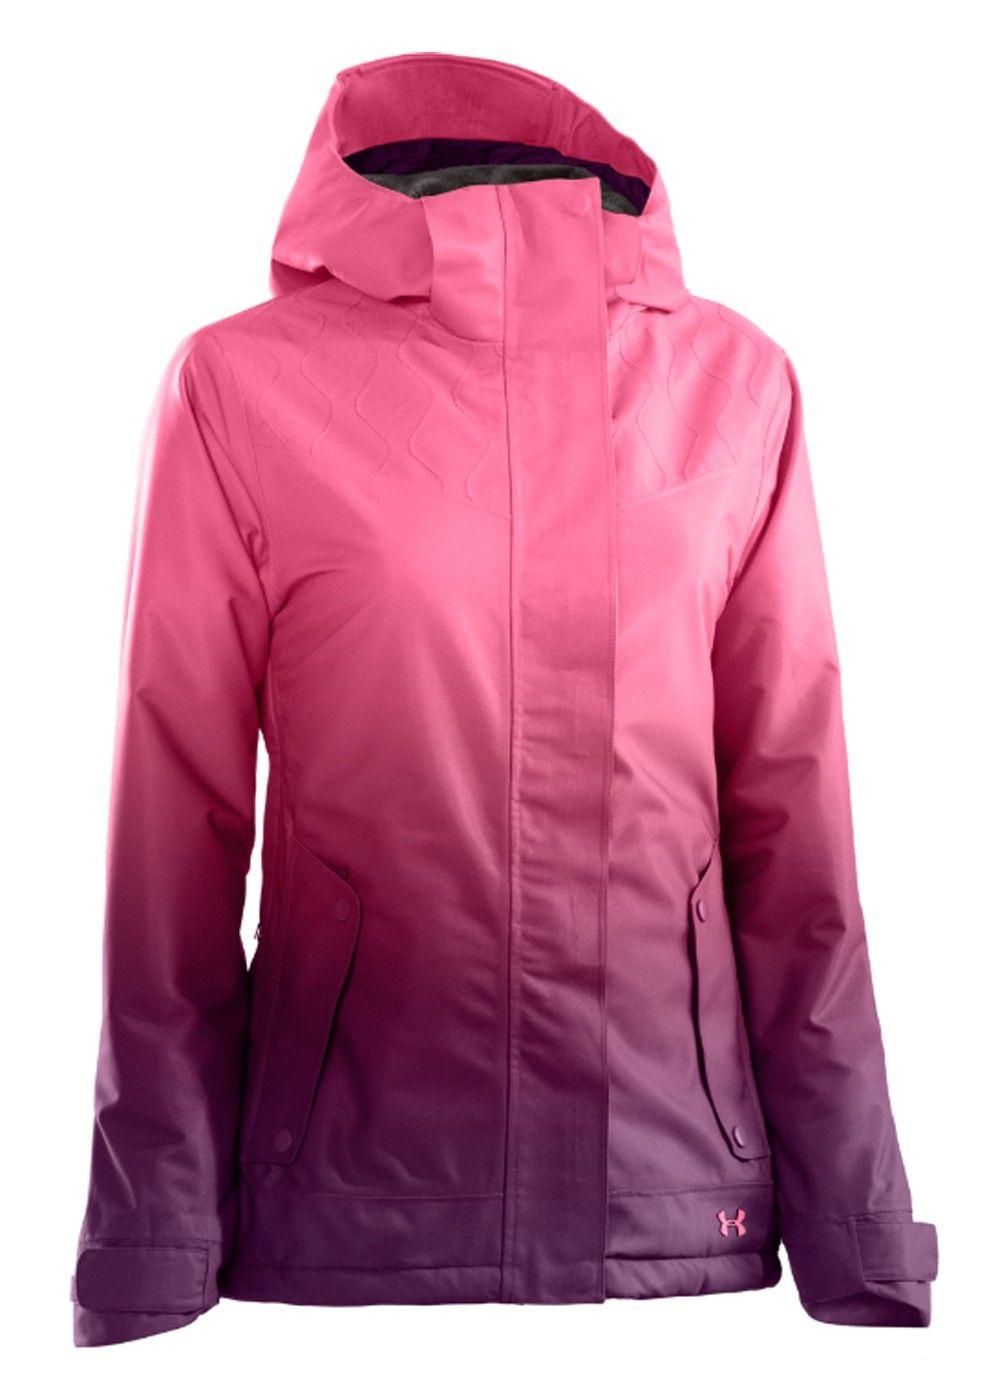 Under Armour Women's Coldgear Infrared Fader Jacket (Lollipop/Velvet/Lollipop)